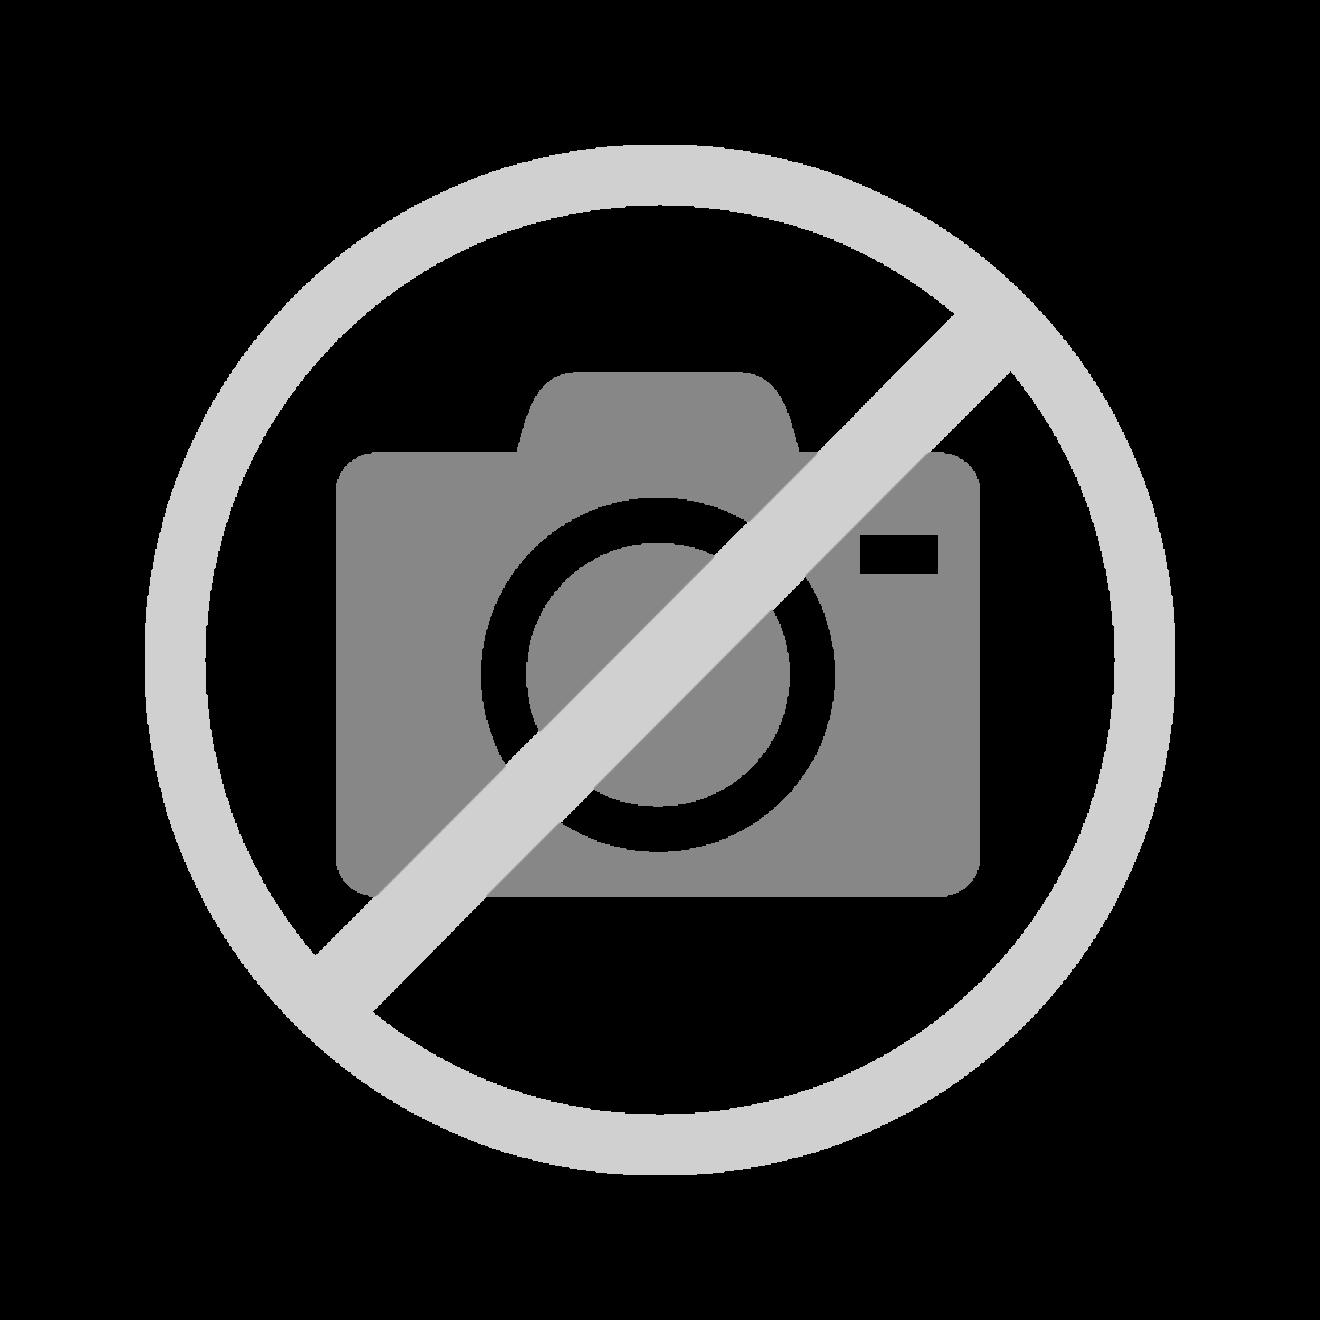 barock hundesofa leo gold barock hundebett online kaufen. Black Bedroom Furniture Sets. Home Design Ideas